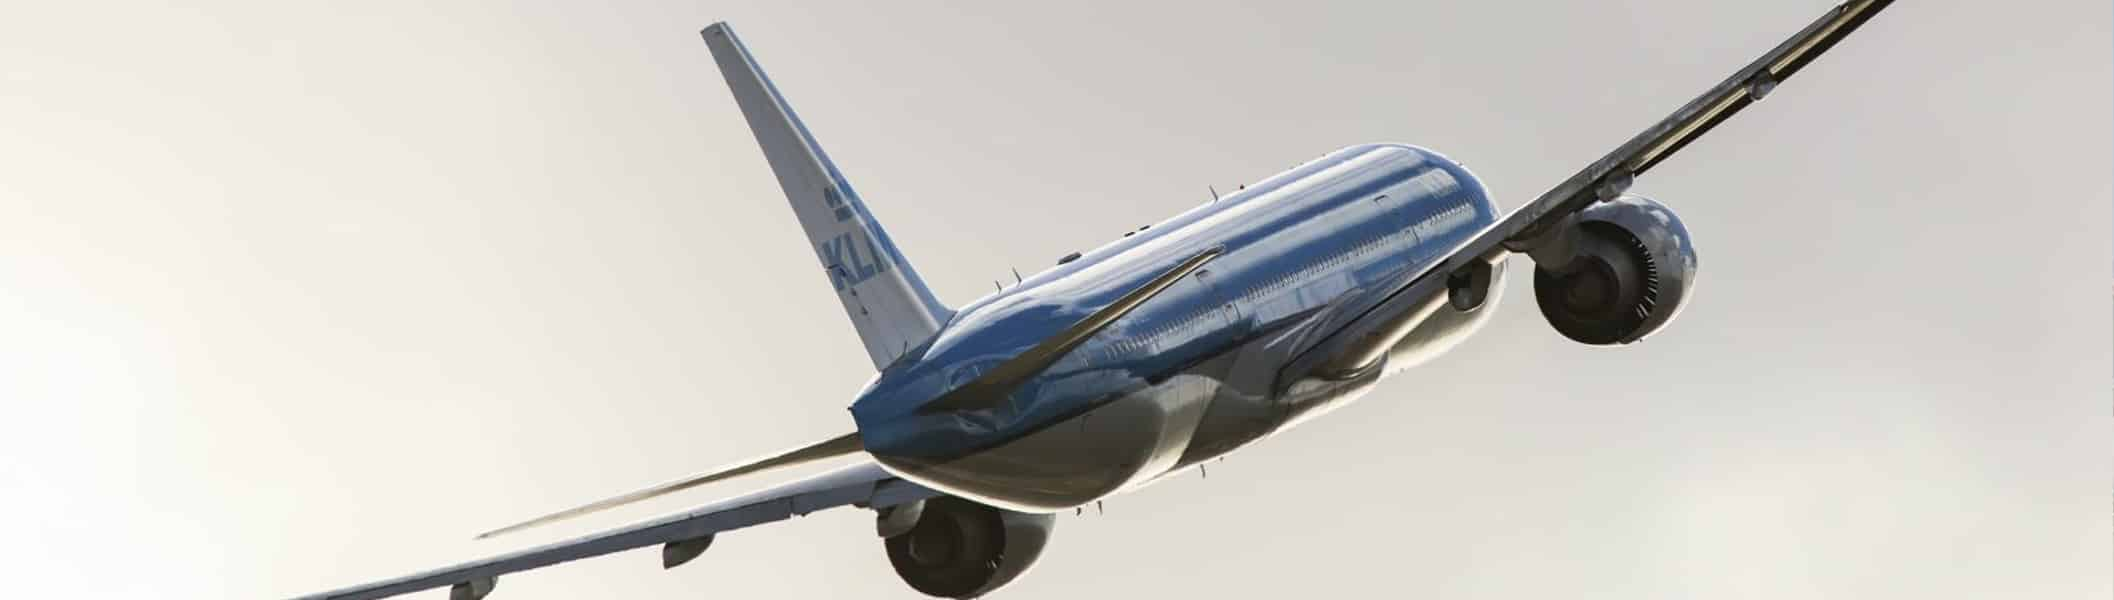 Air France-KLM Third Quarter Results: Profits Slide